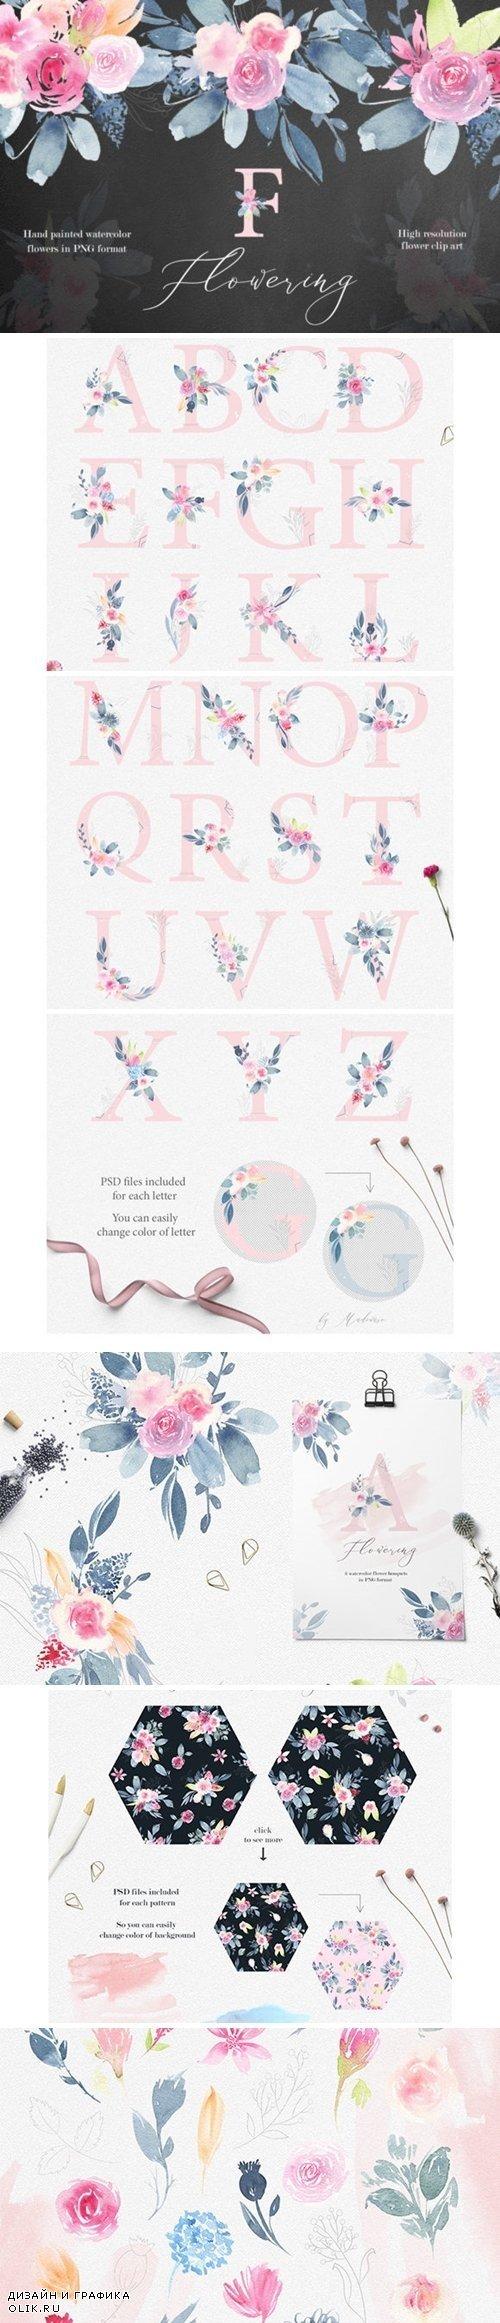 Flowering watercolor graphic set - 2558403